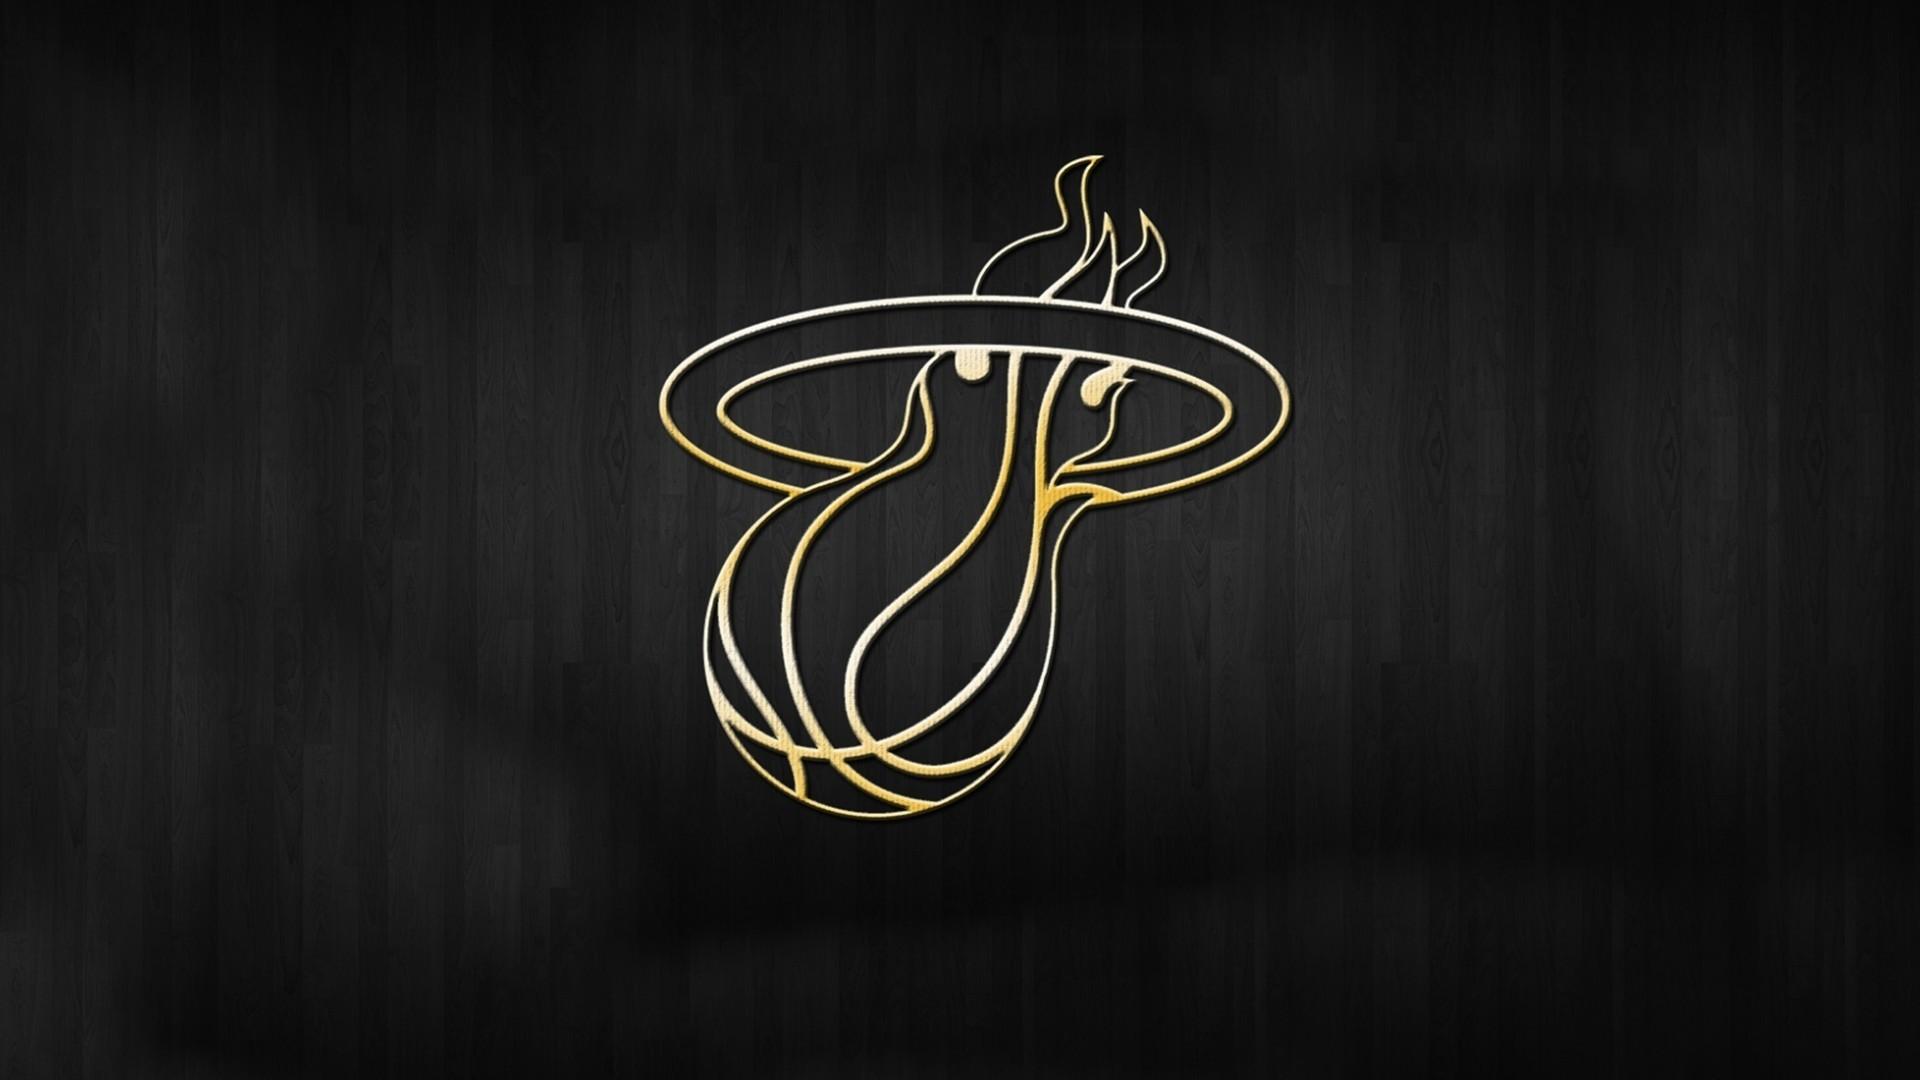 Res: 1920x1080, Gold logo basketball team